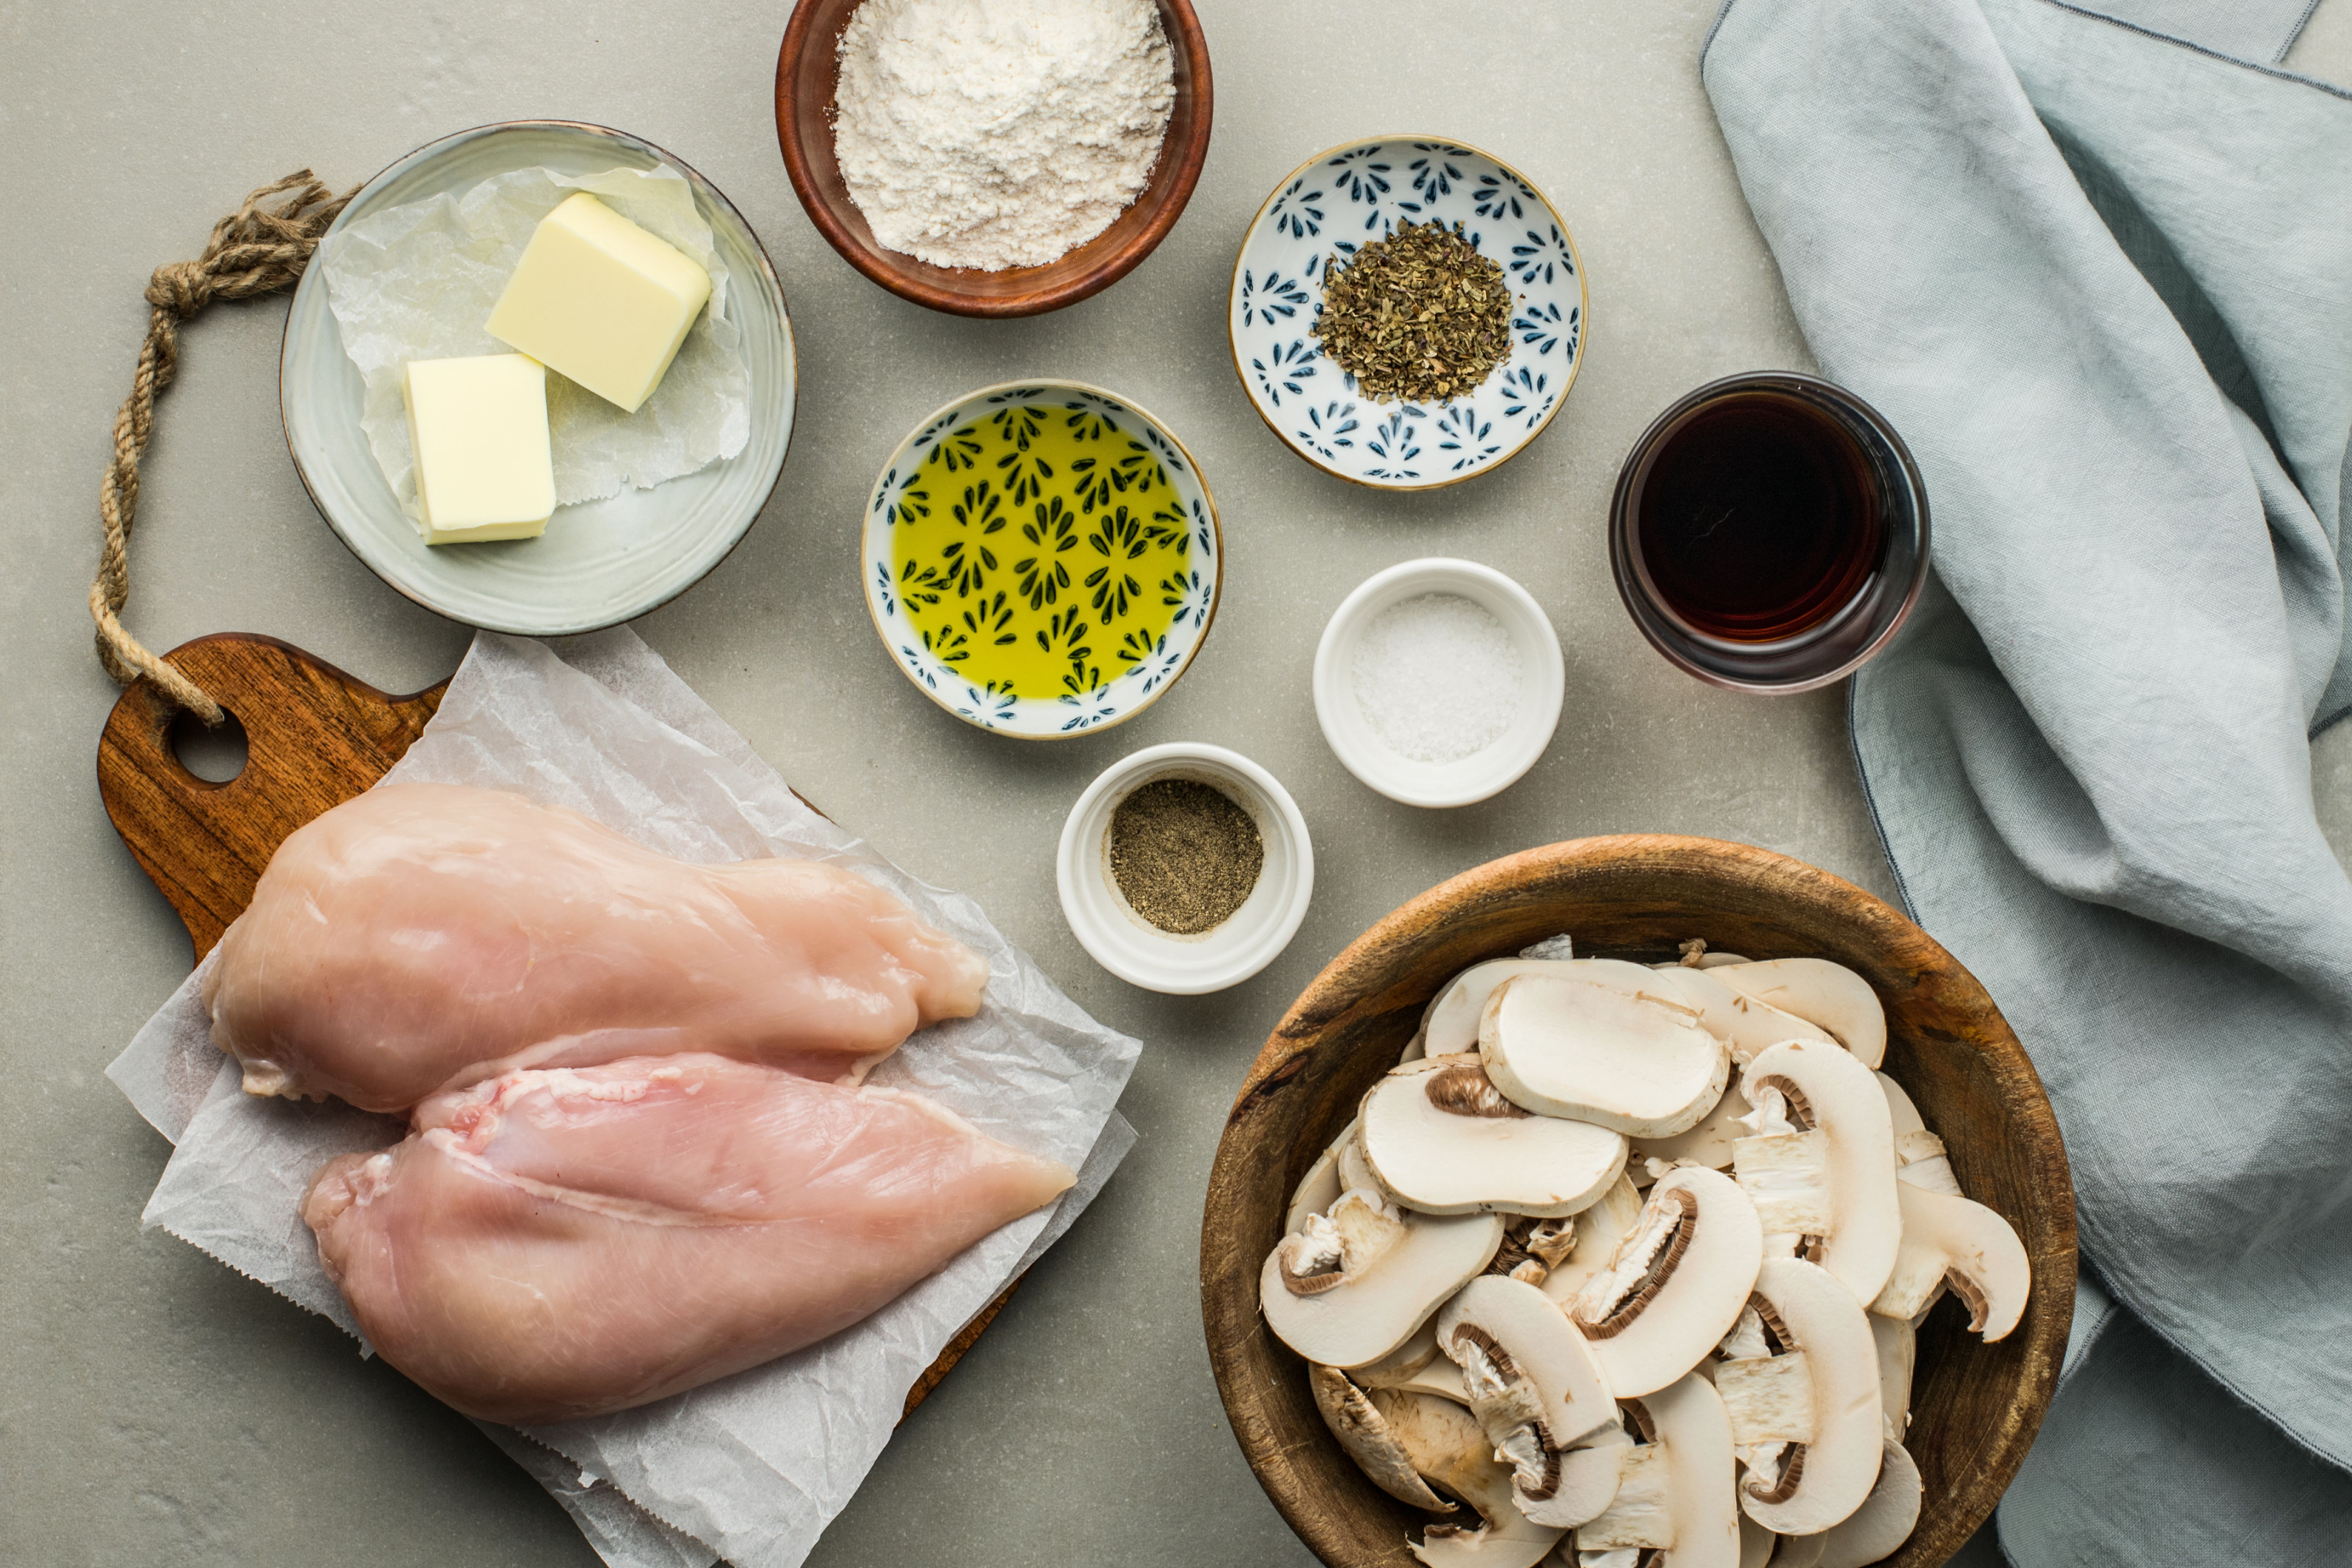 Ingredients for chicken marsala recipe